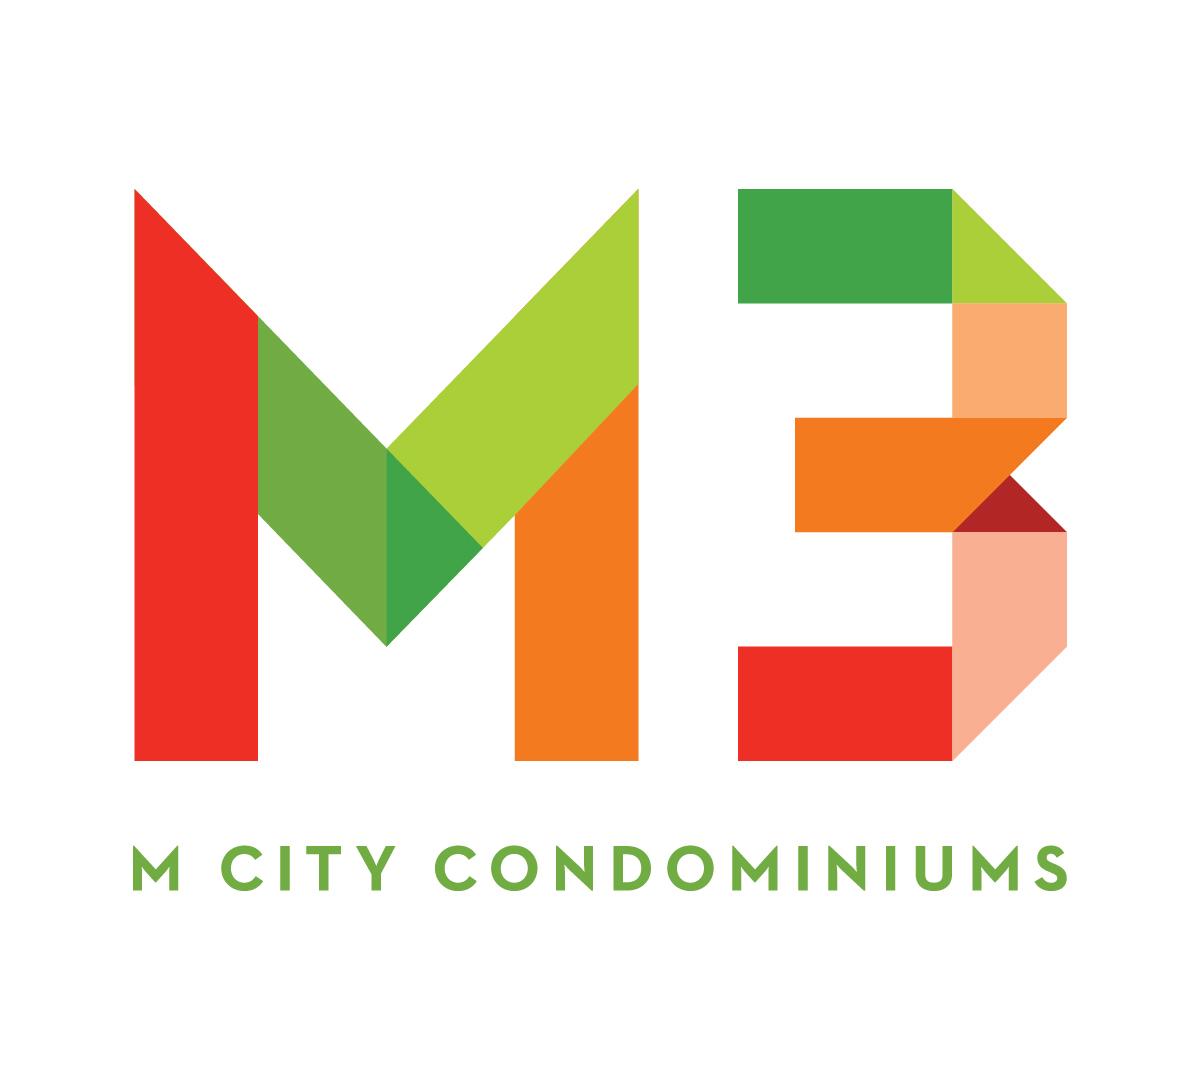 M CITY LOGO